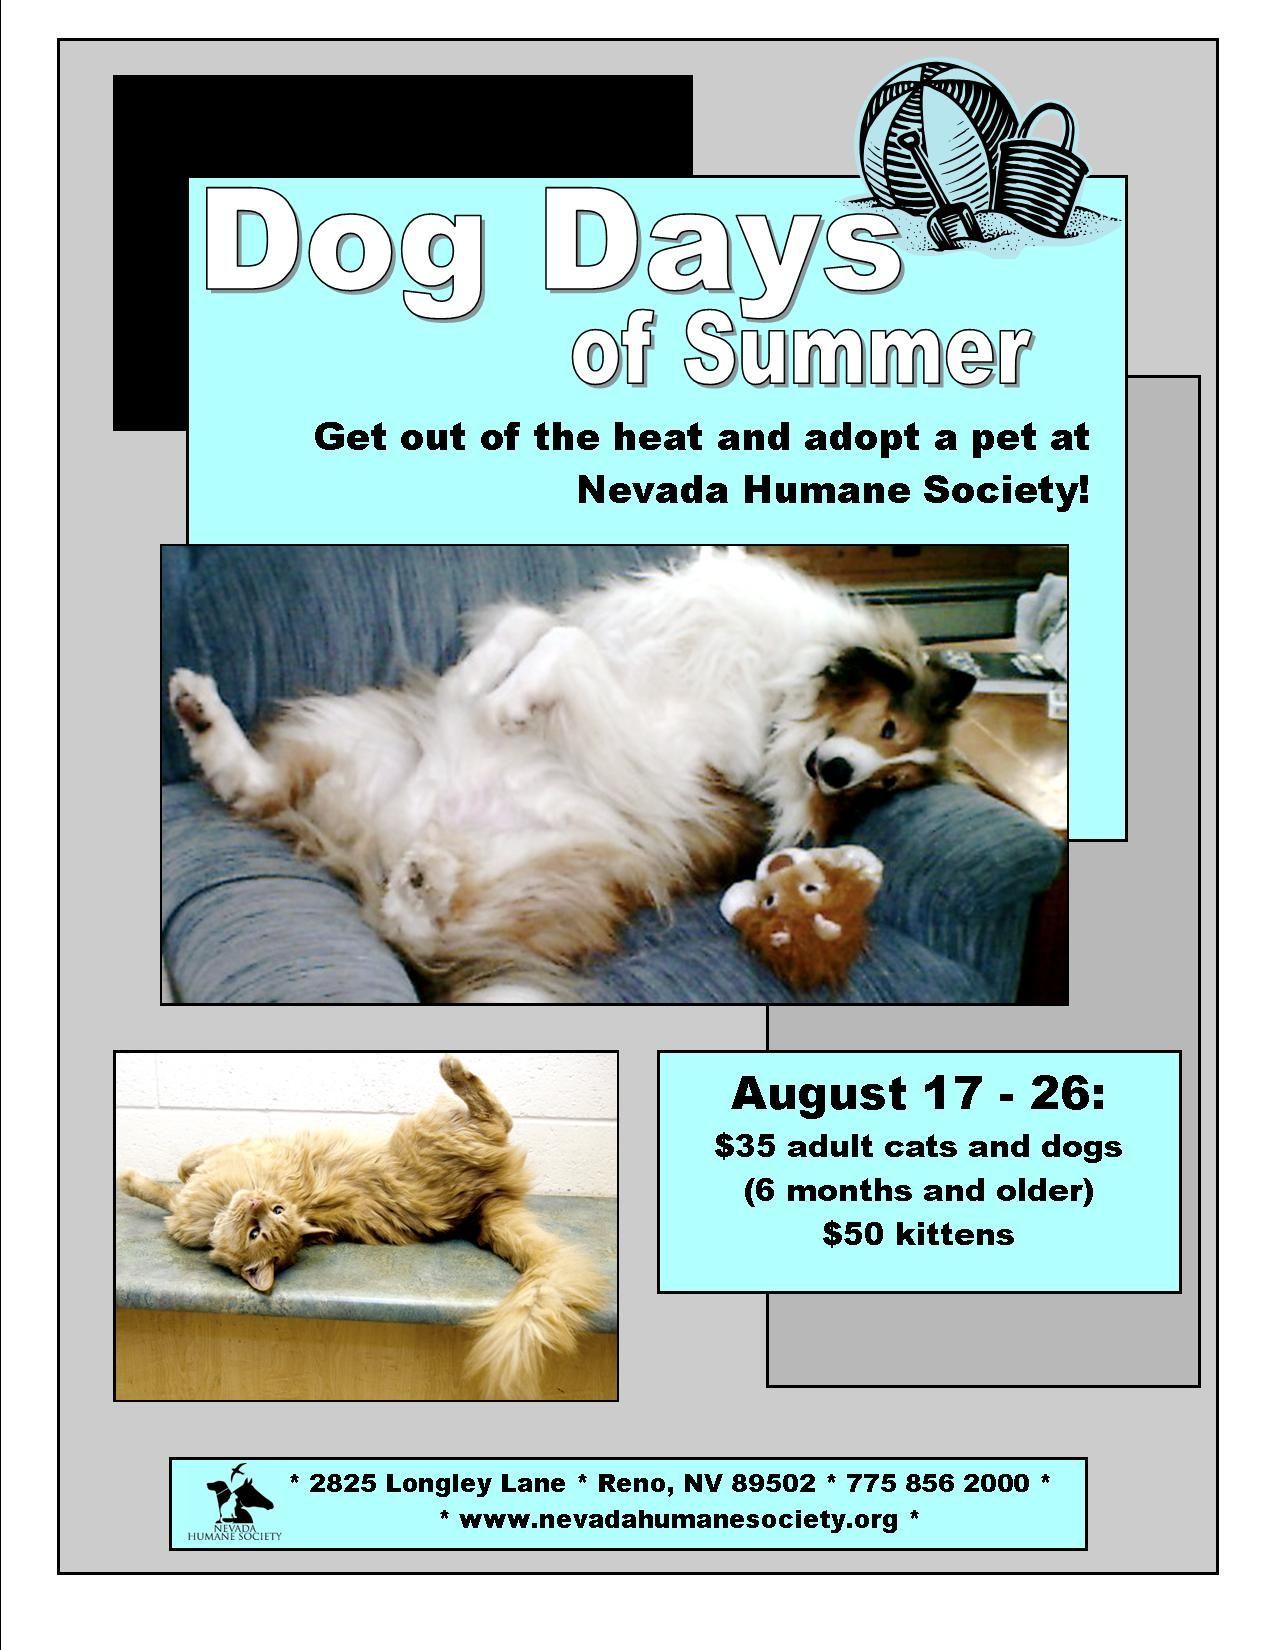 Increase Adoptions Adoption, Cat shelter, Humane society